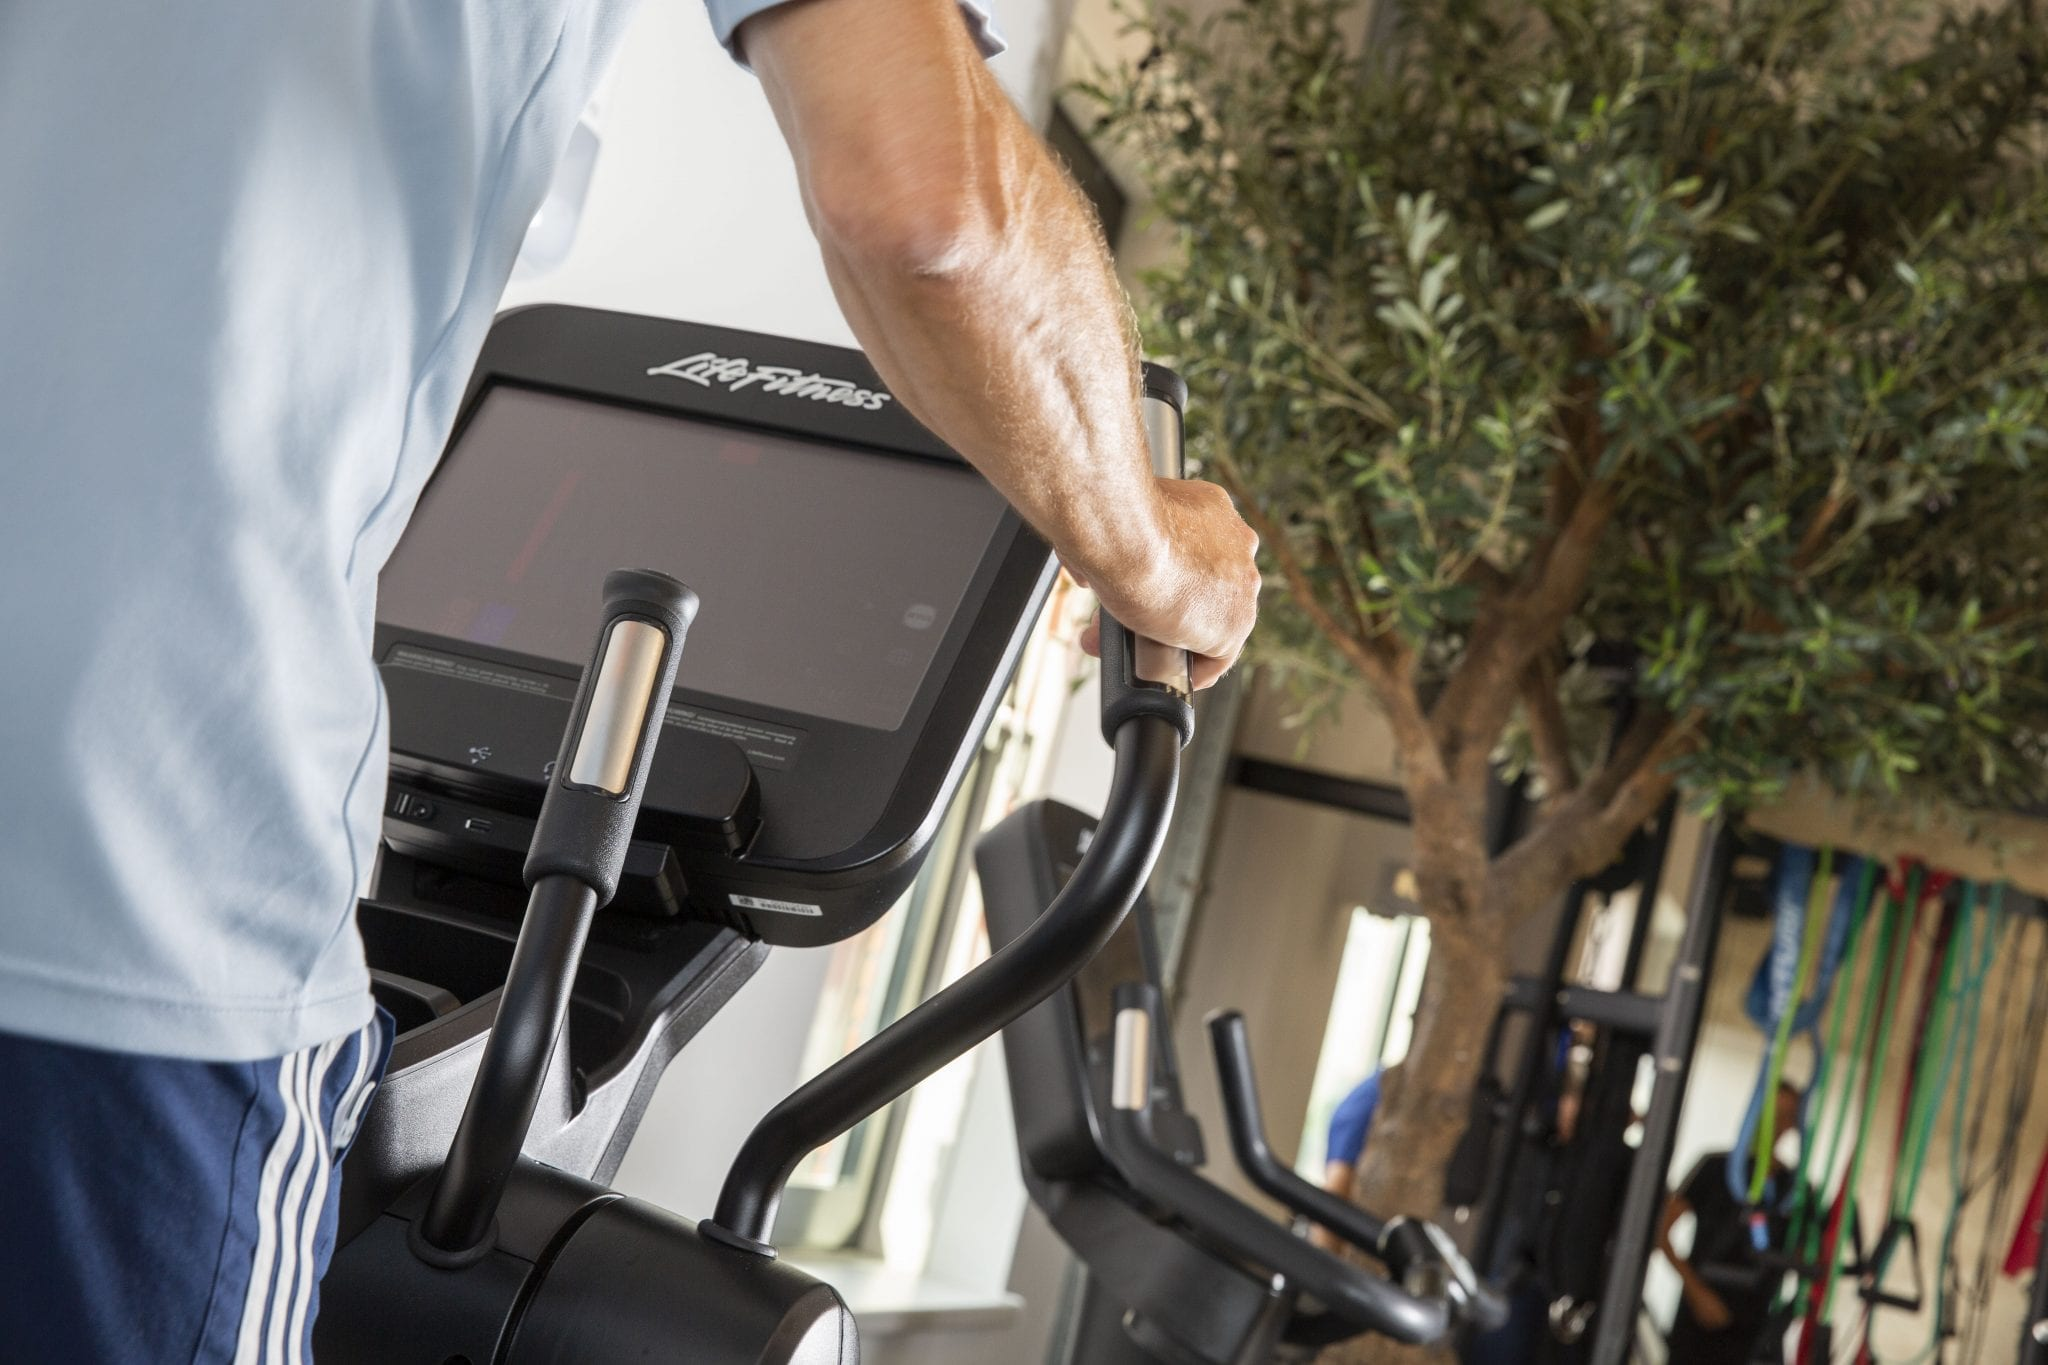 Vrije Training, Cardio loopmachine | Monné Zorg & Beweging Breda